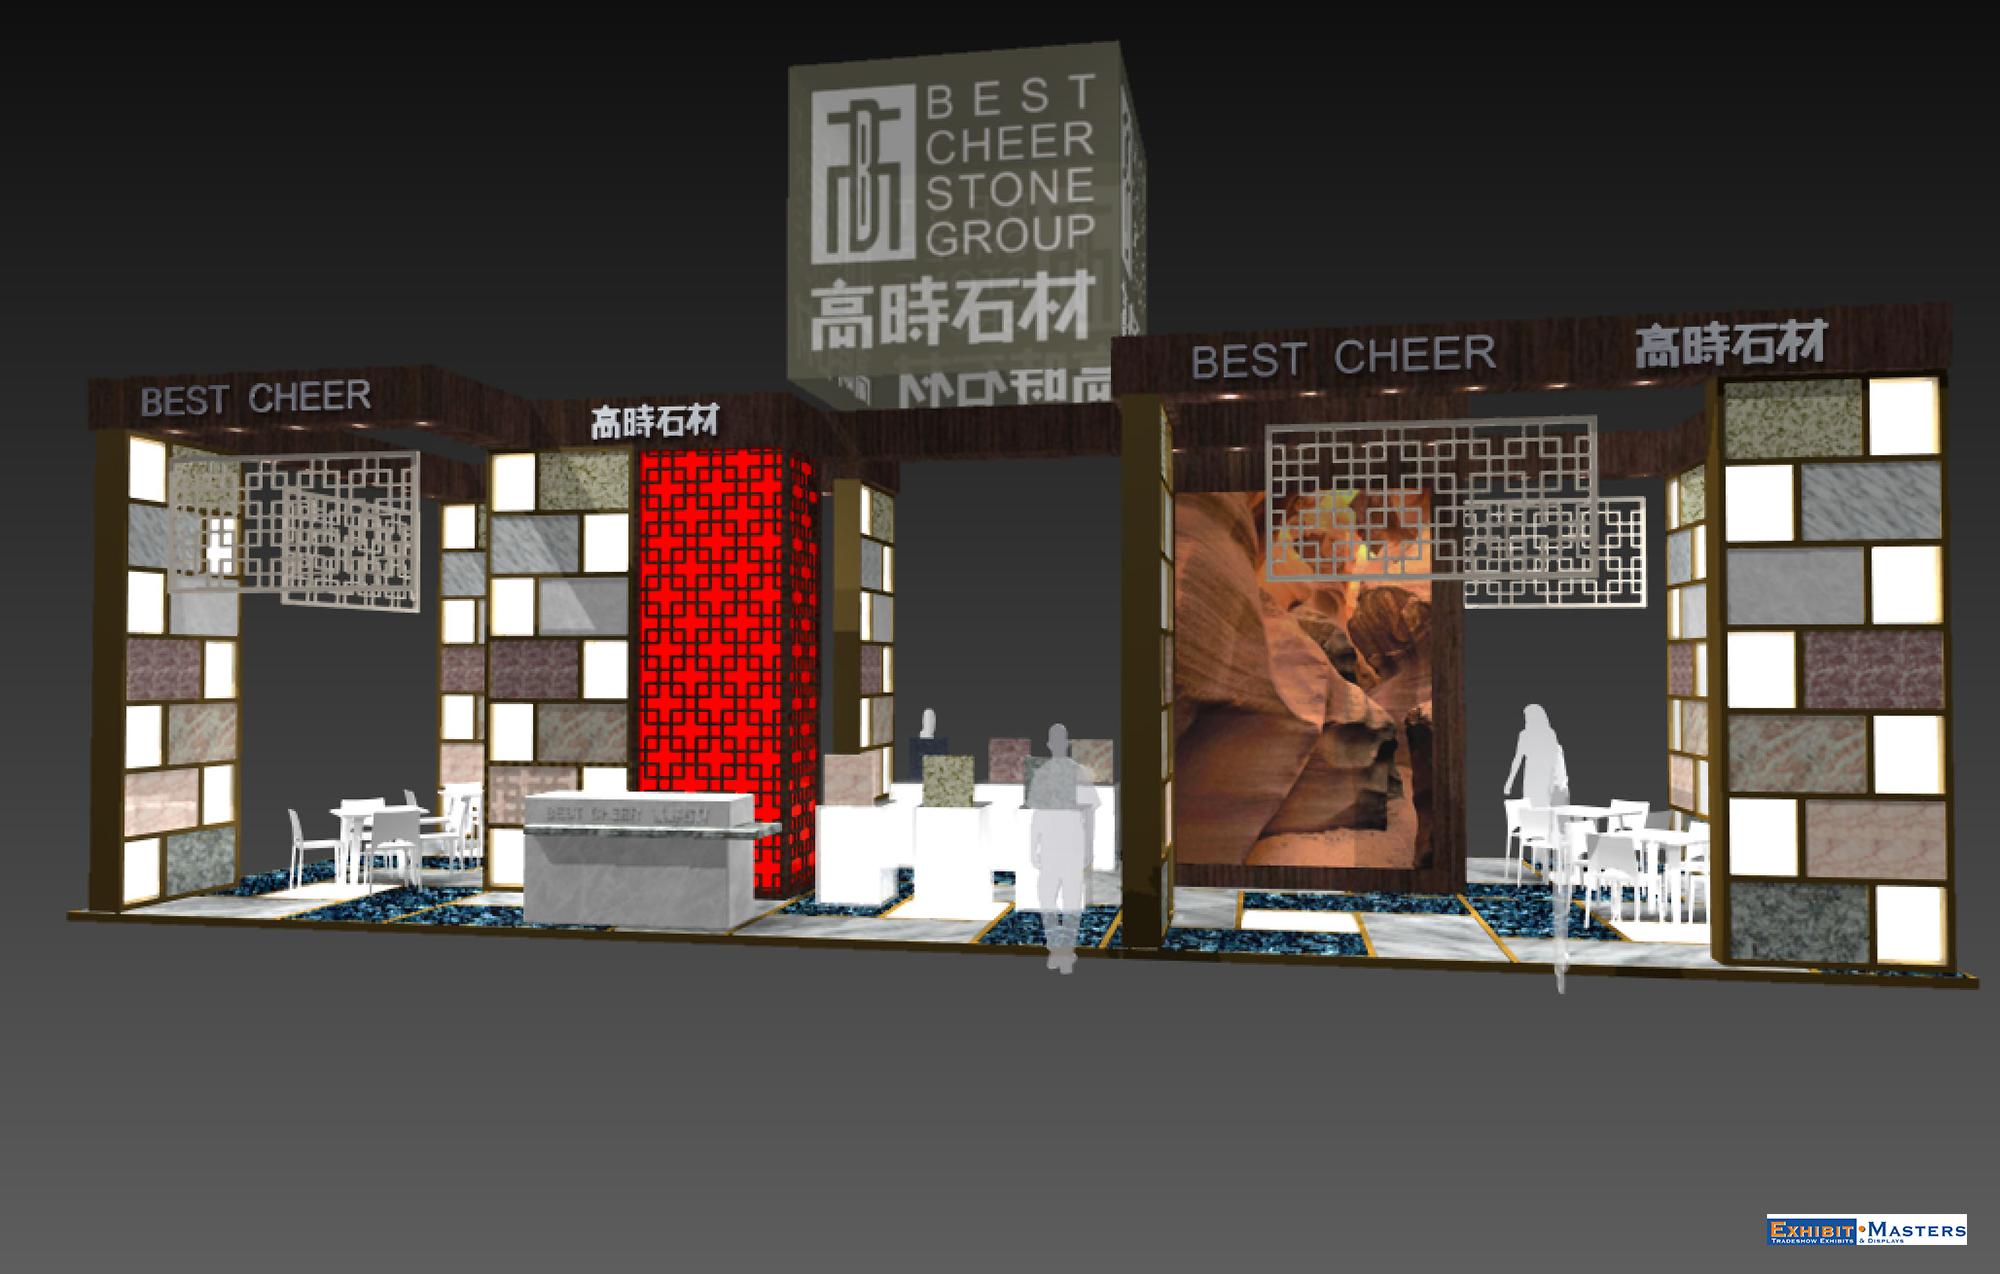 Draft of custom-designed trade show booth